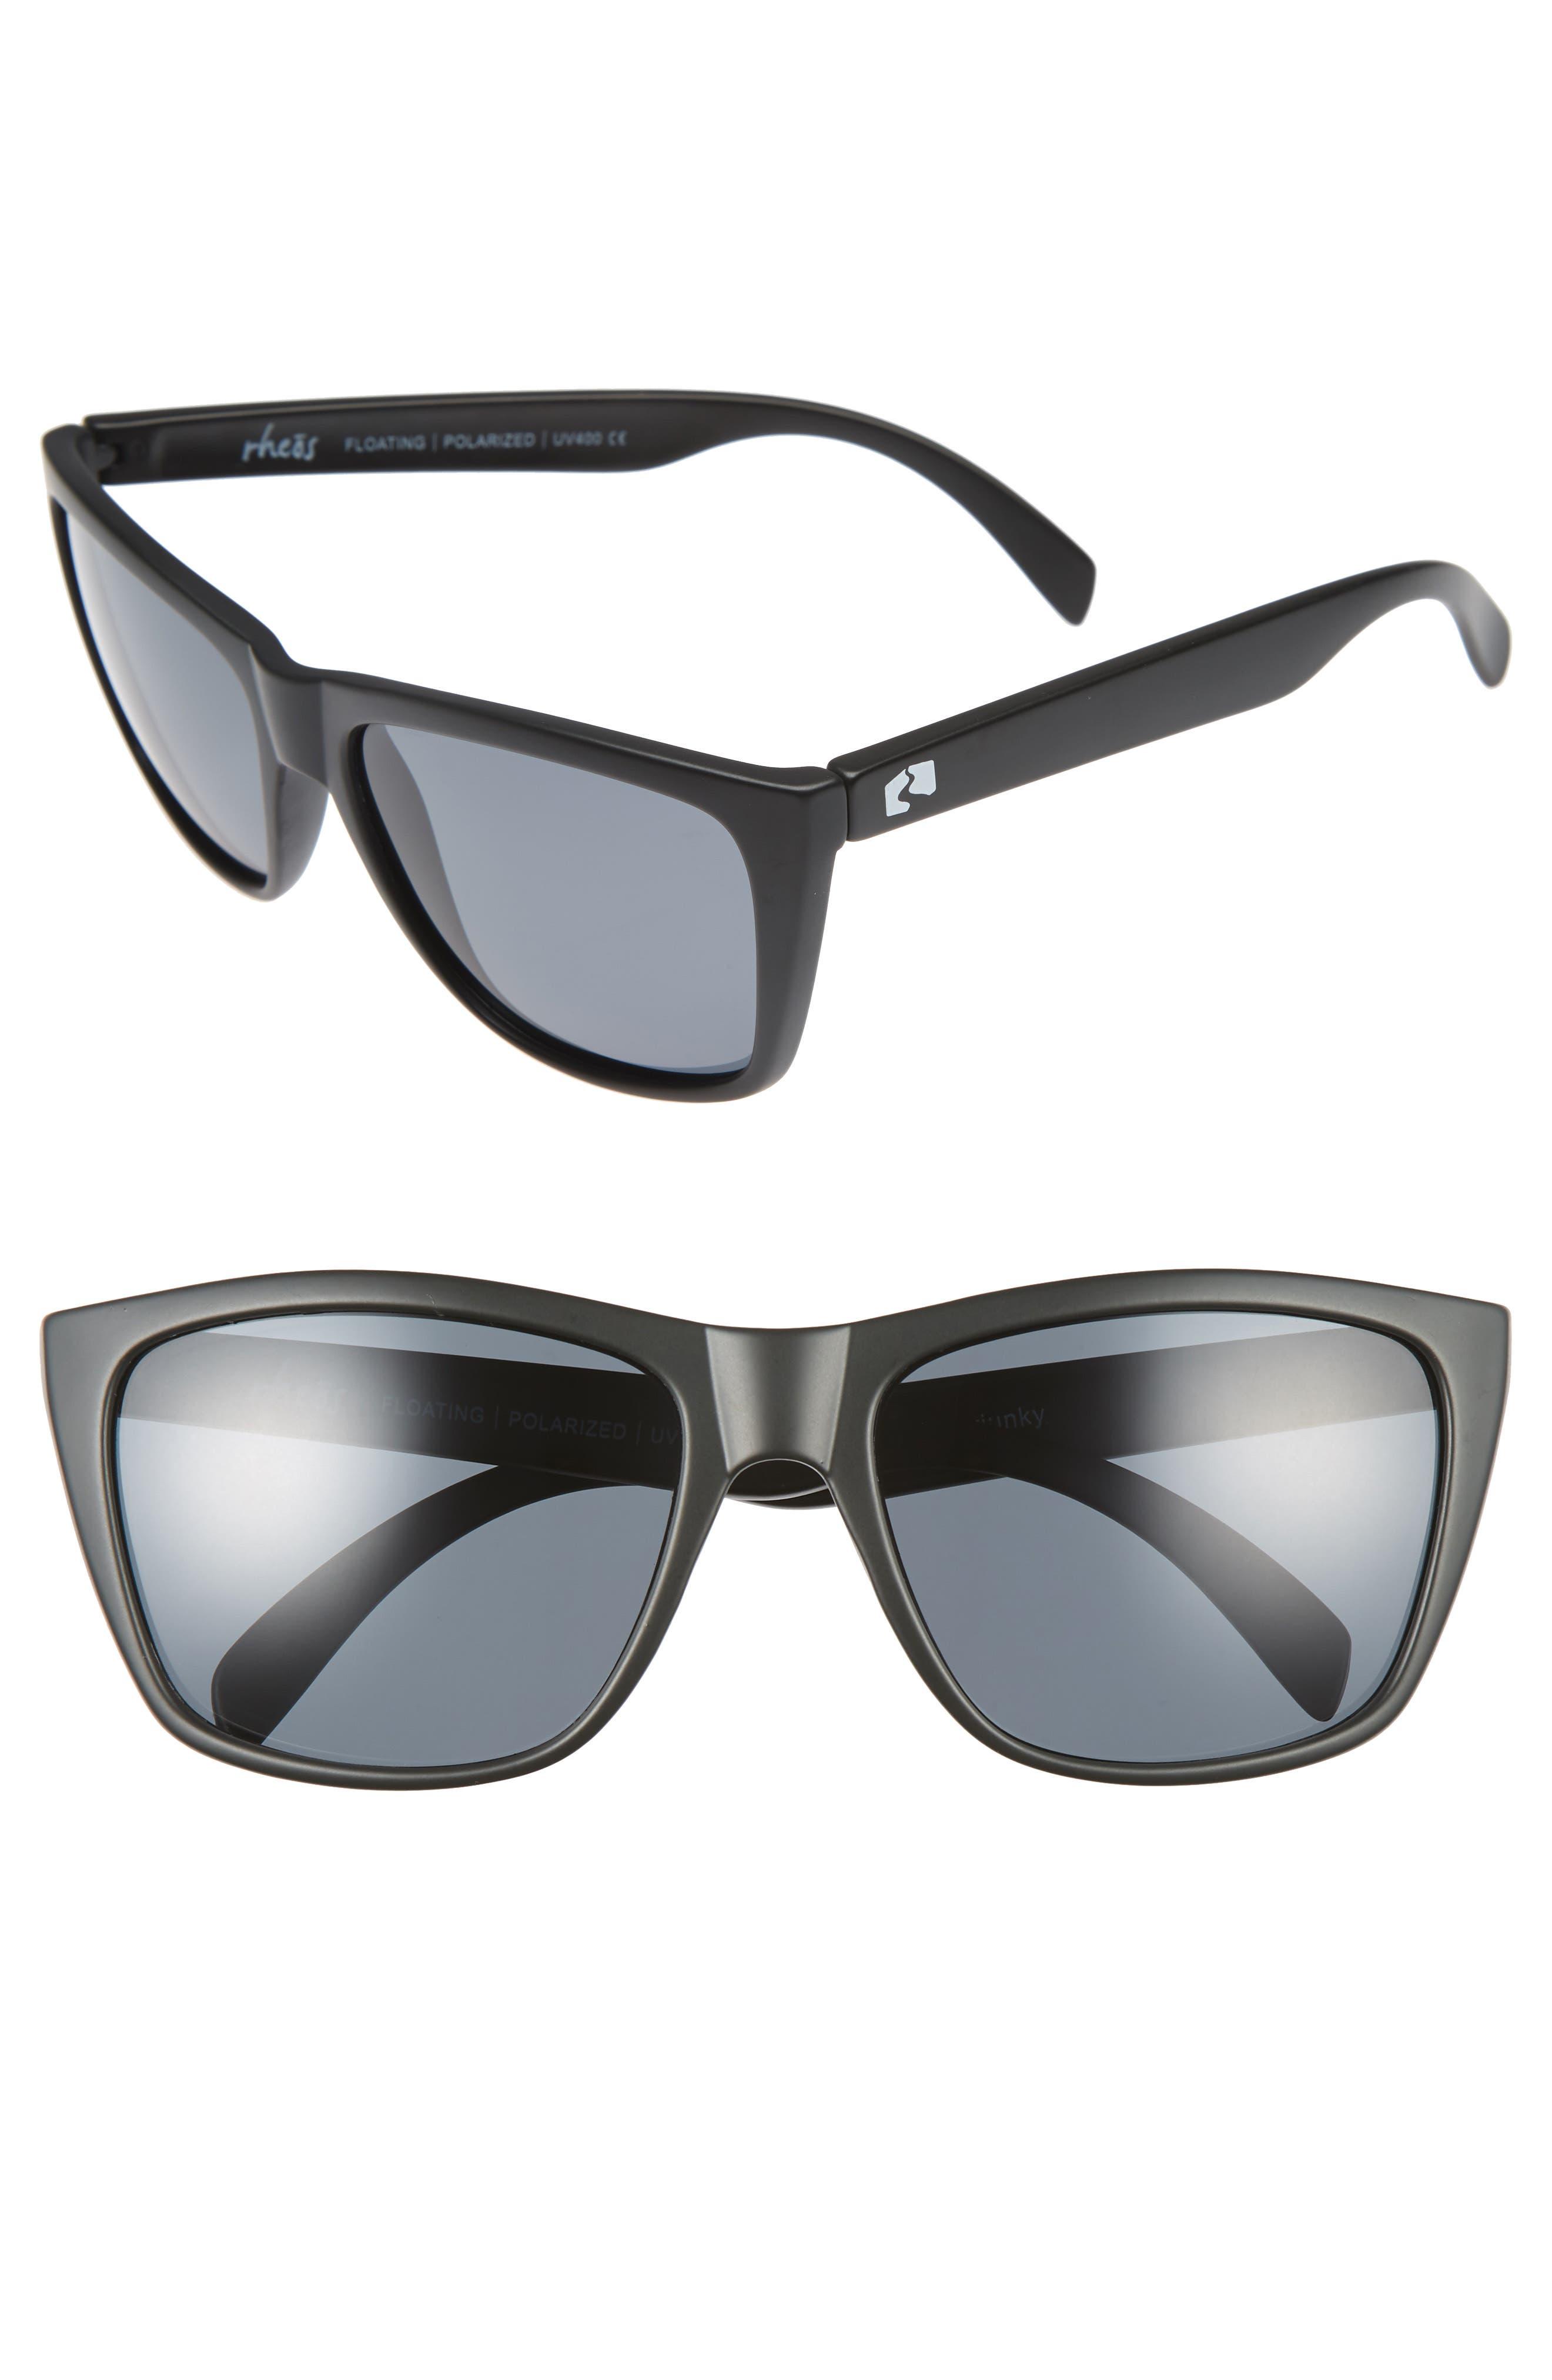 Sapelos Floating 61mm Polarized Sunglasses,                             Main thumbnail 1, color,                             001